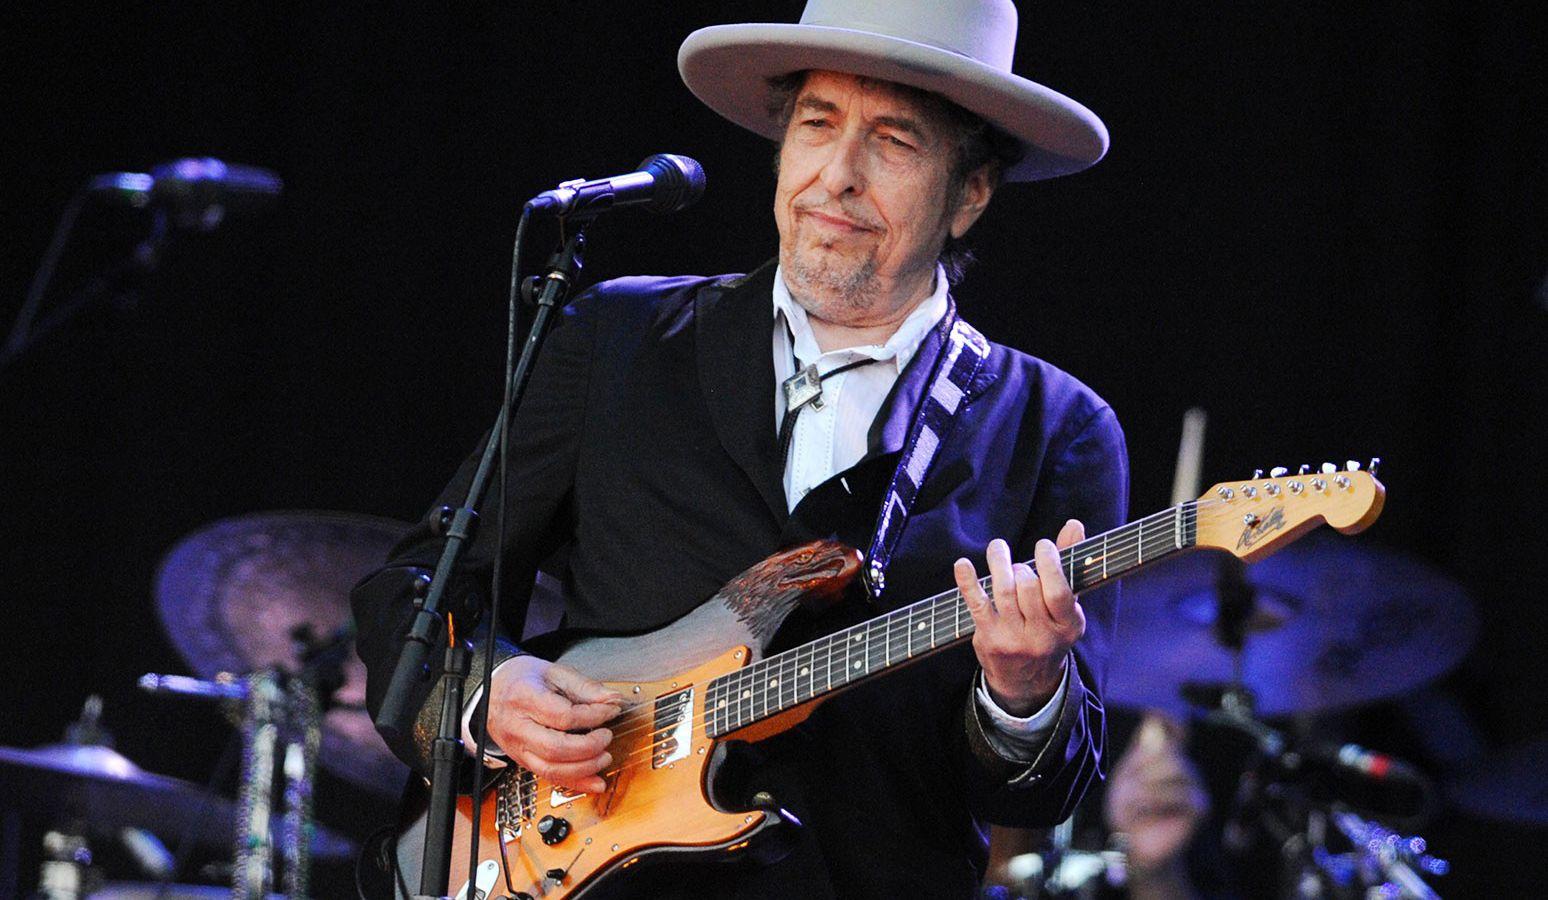 Bob Dylan: Μια σπάνια συναυλία του διαθέσιμη δωρεάν στο YouTube